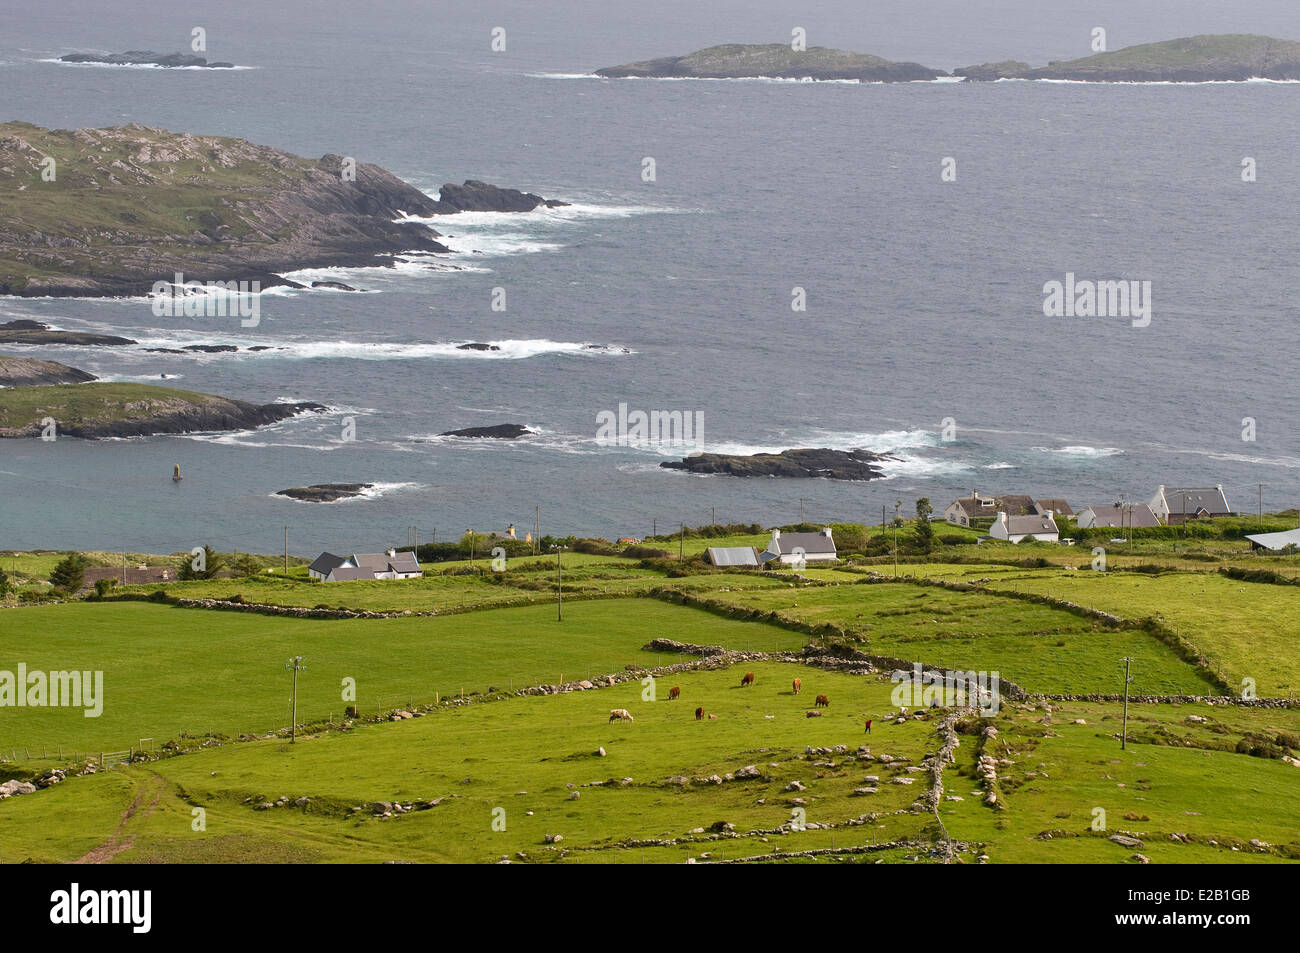 Ireland, County Kerry, Caherdaniel, bad weather on the coast - Stock Image